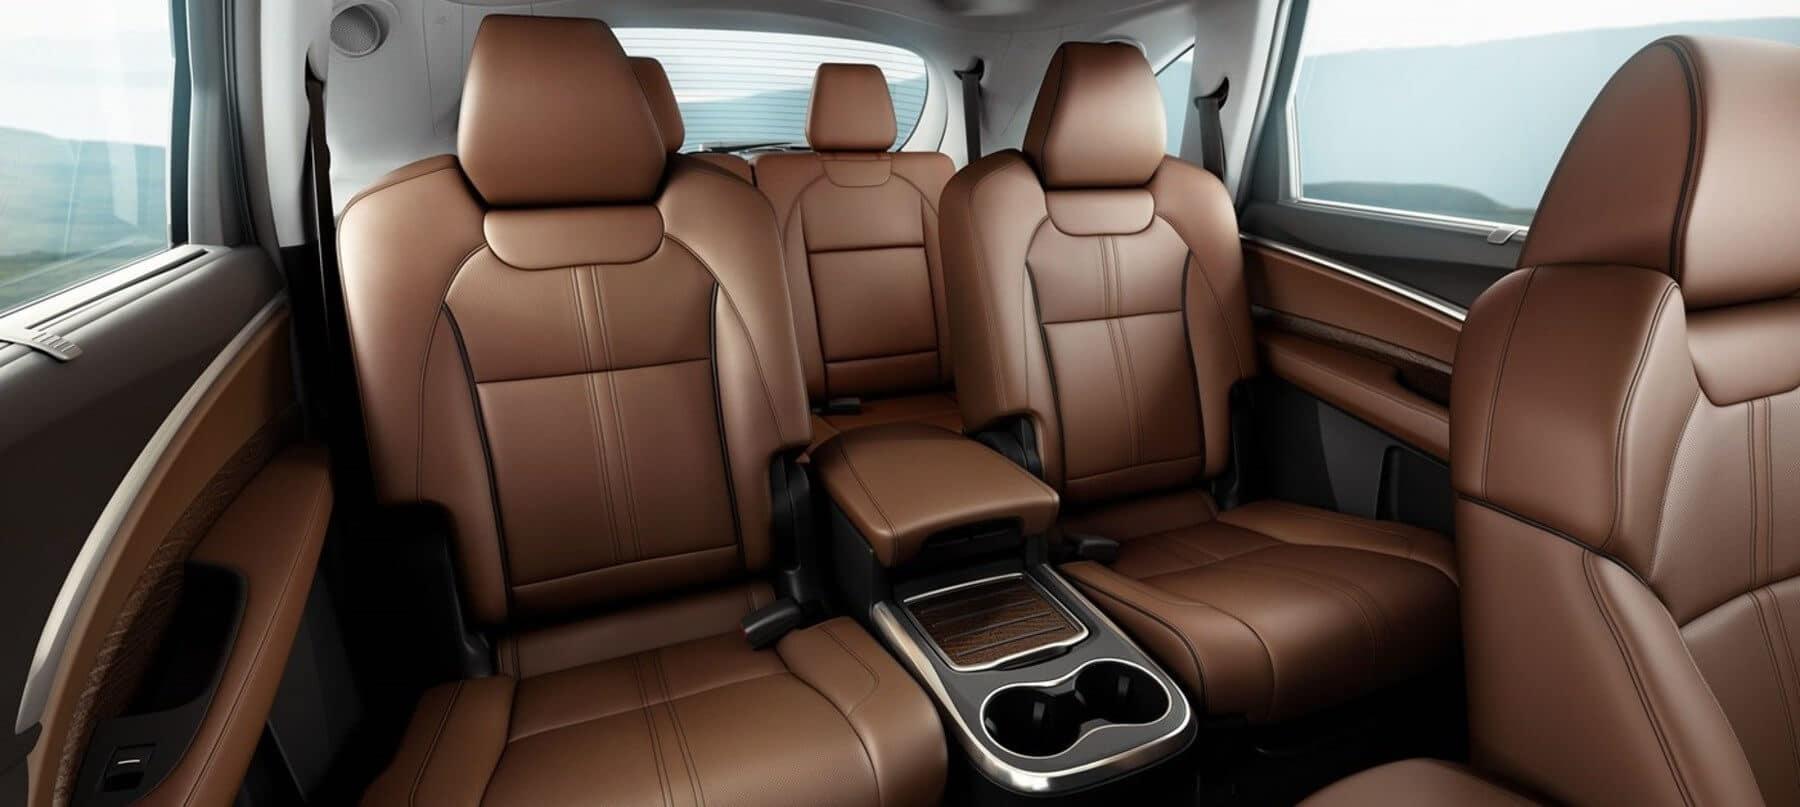 2018 Acura MDX Seating | Kansas City Acura Dealers